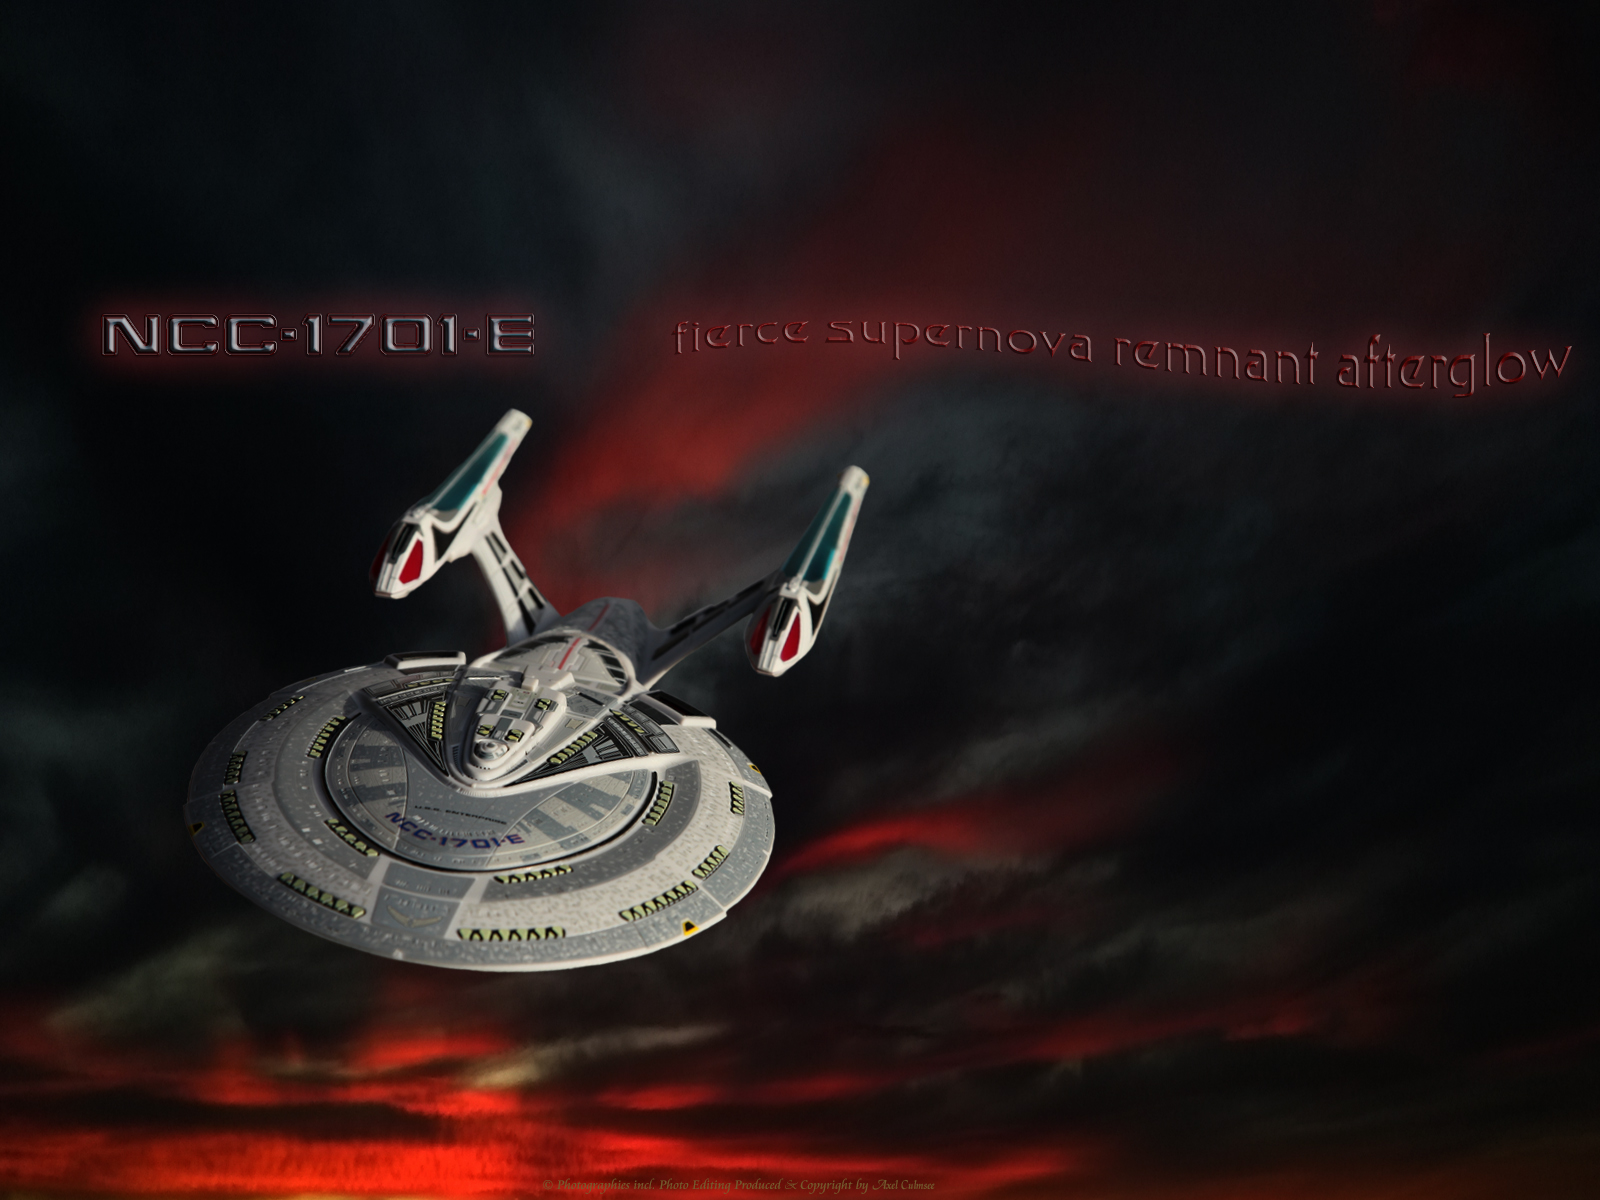 Enterprise-E fierce supernova remnant afterglow